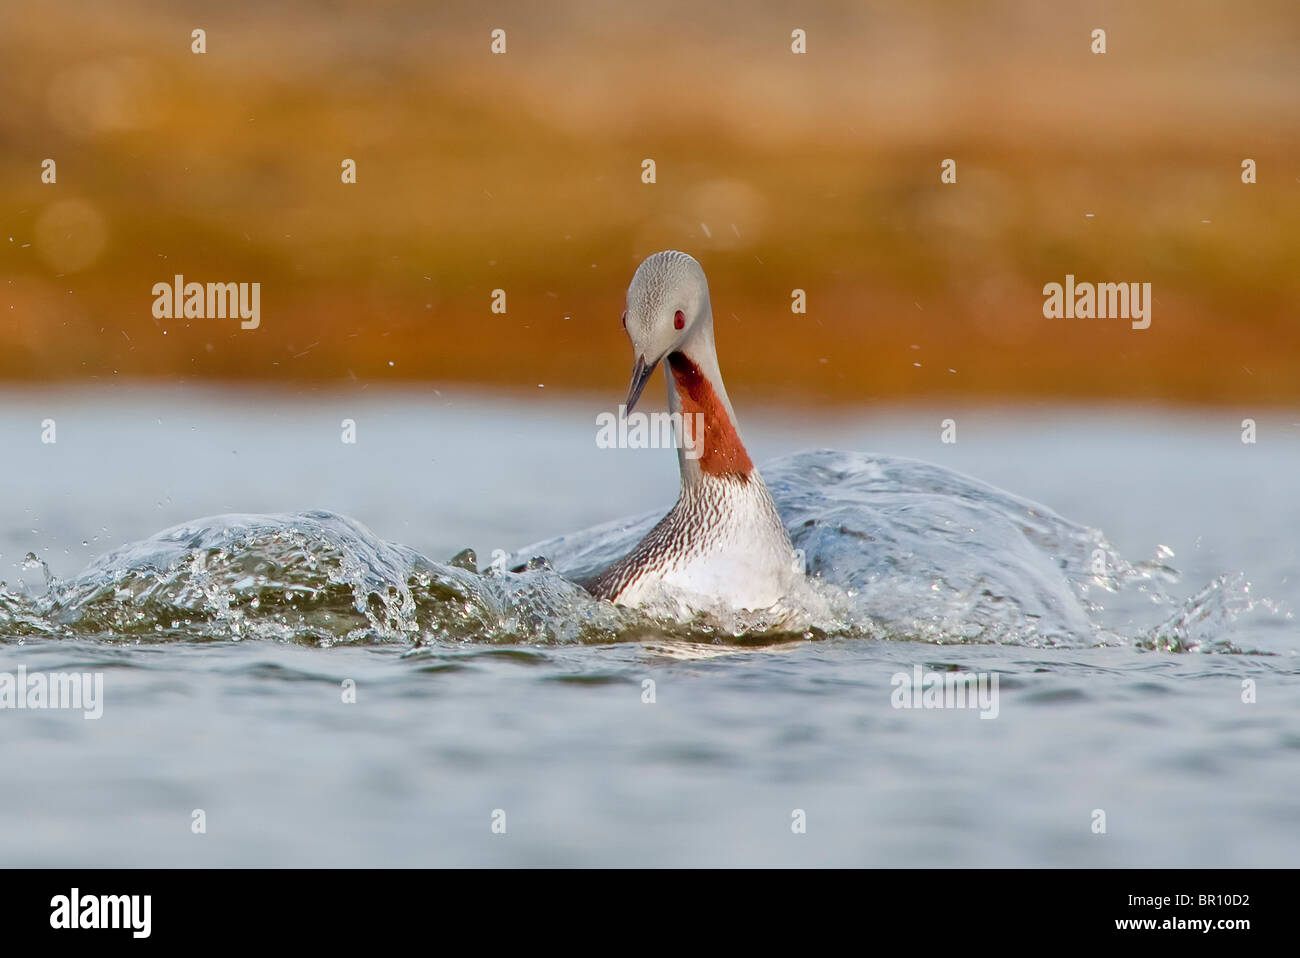 RED-THROATED DIVER (Gavia stellata) splashing at remote lake - Stock Image